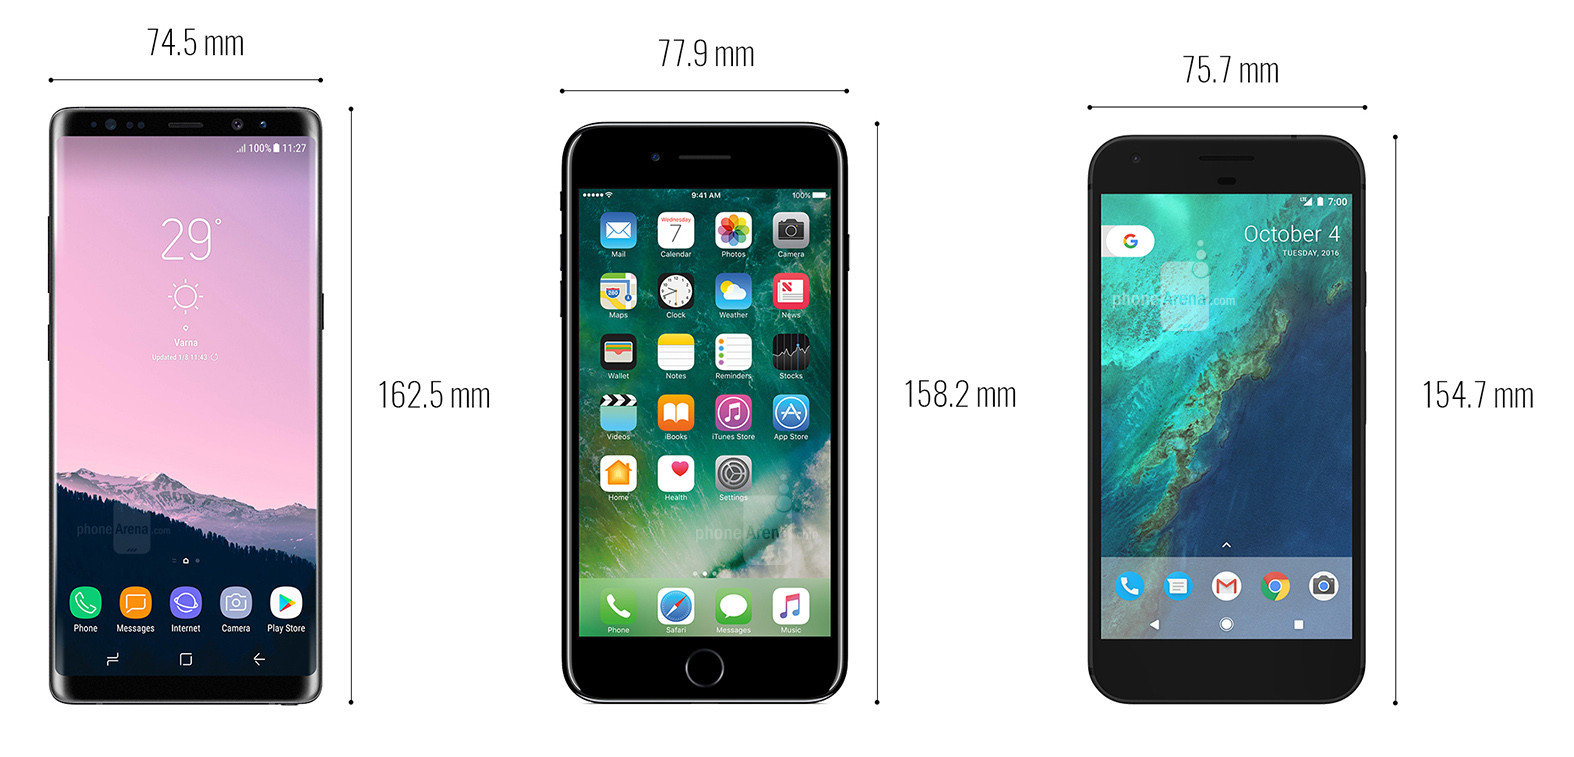 1501772618_samsung-galaxy-note-8-vs-apple-iphone-7-vs-google-pixel.jpg